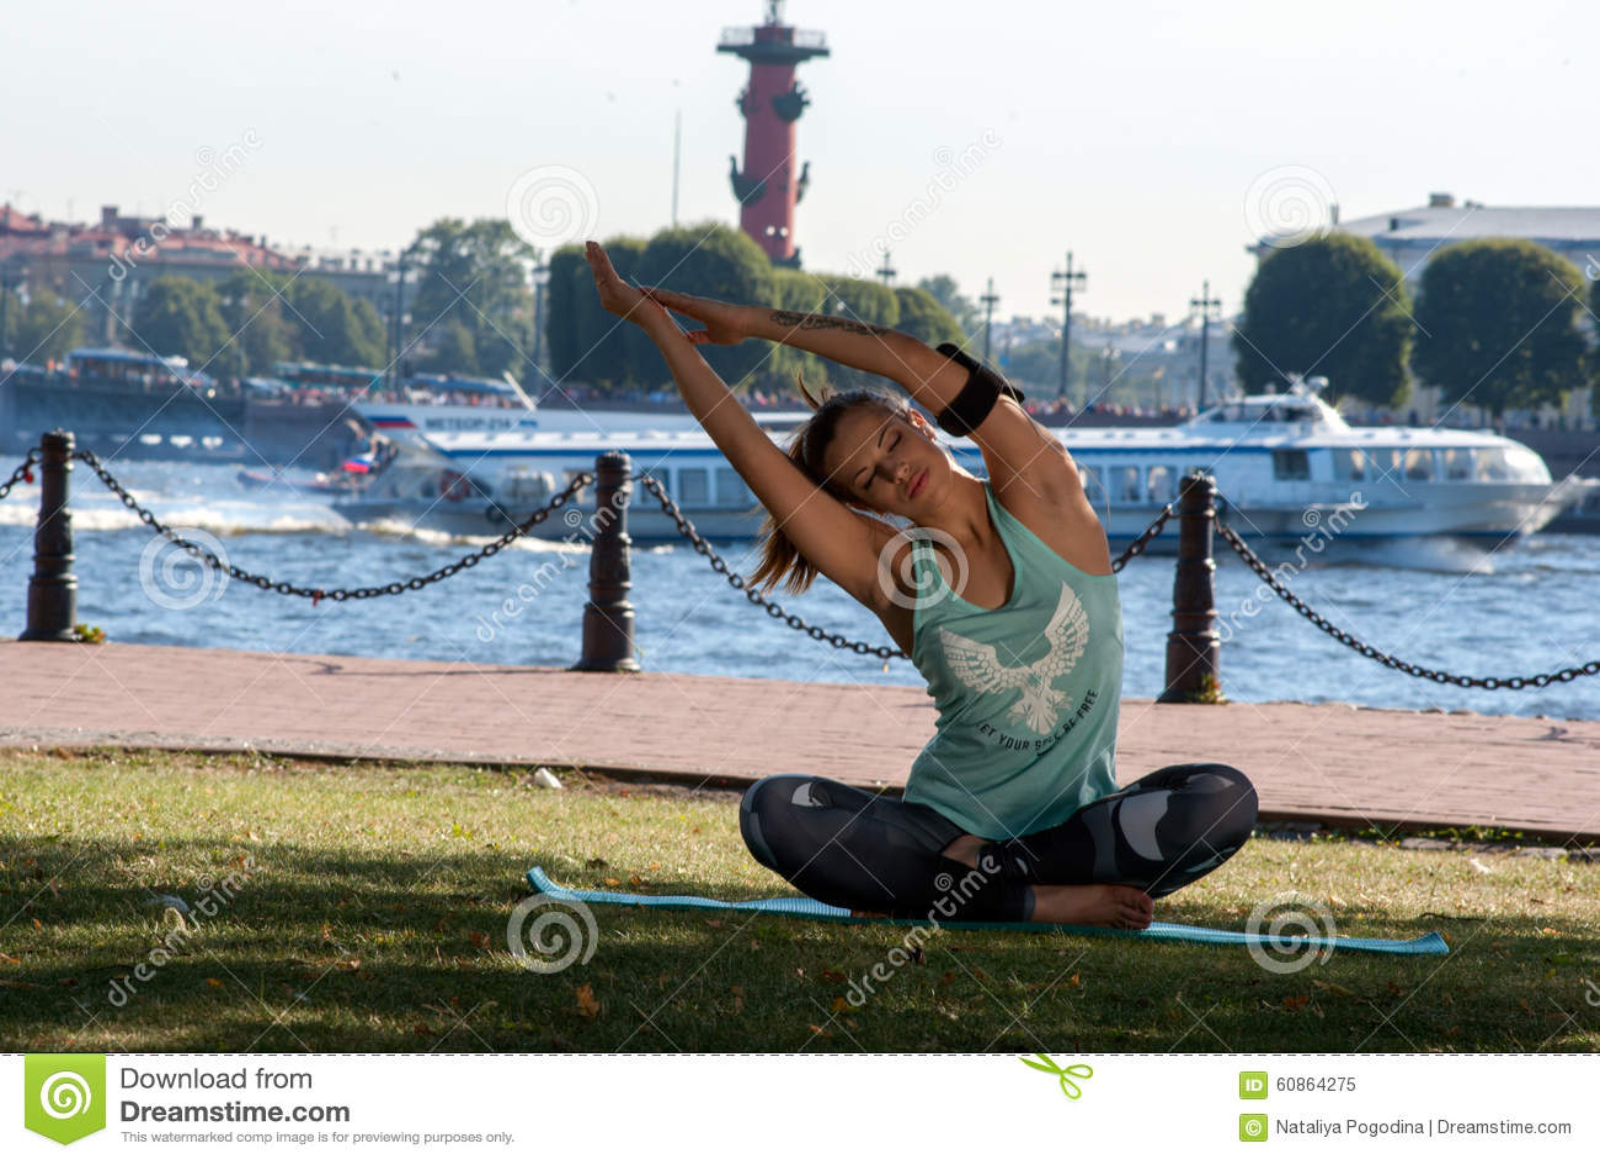 IY-SP - Iyengar Yoga School of St. Pete & Tampa Bay